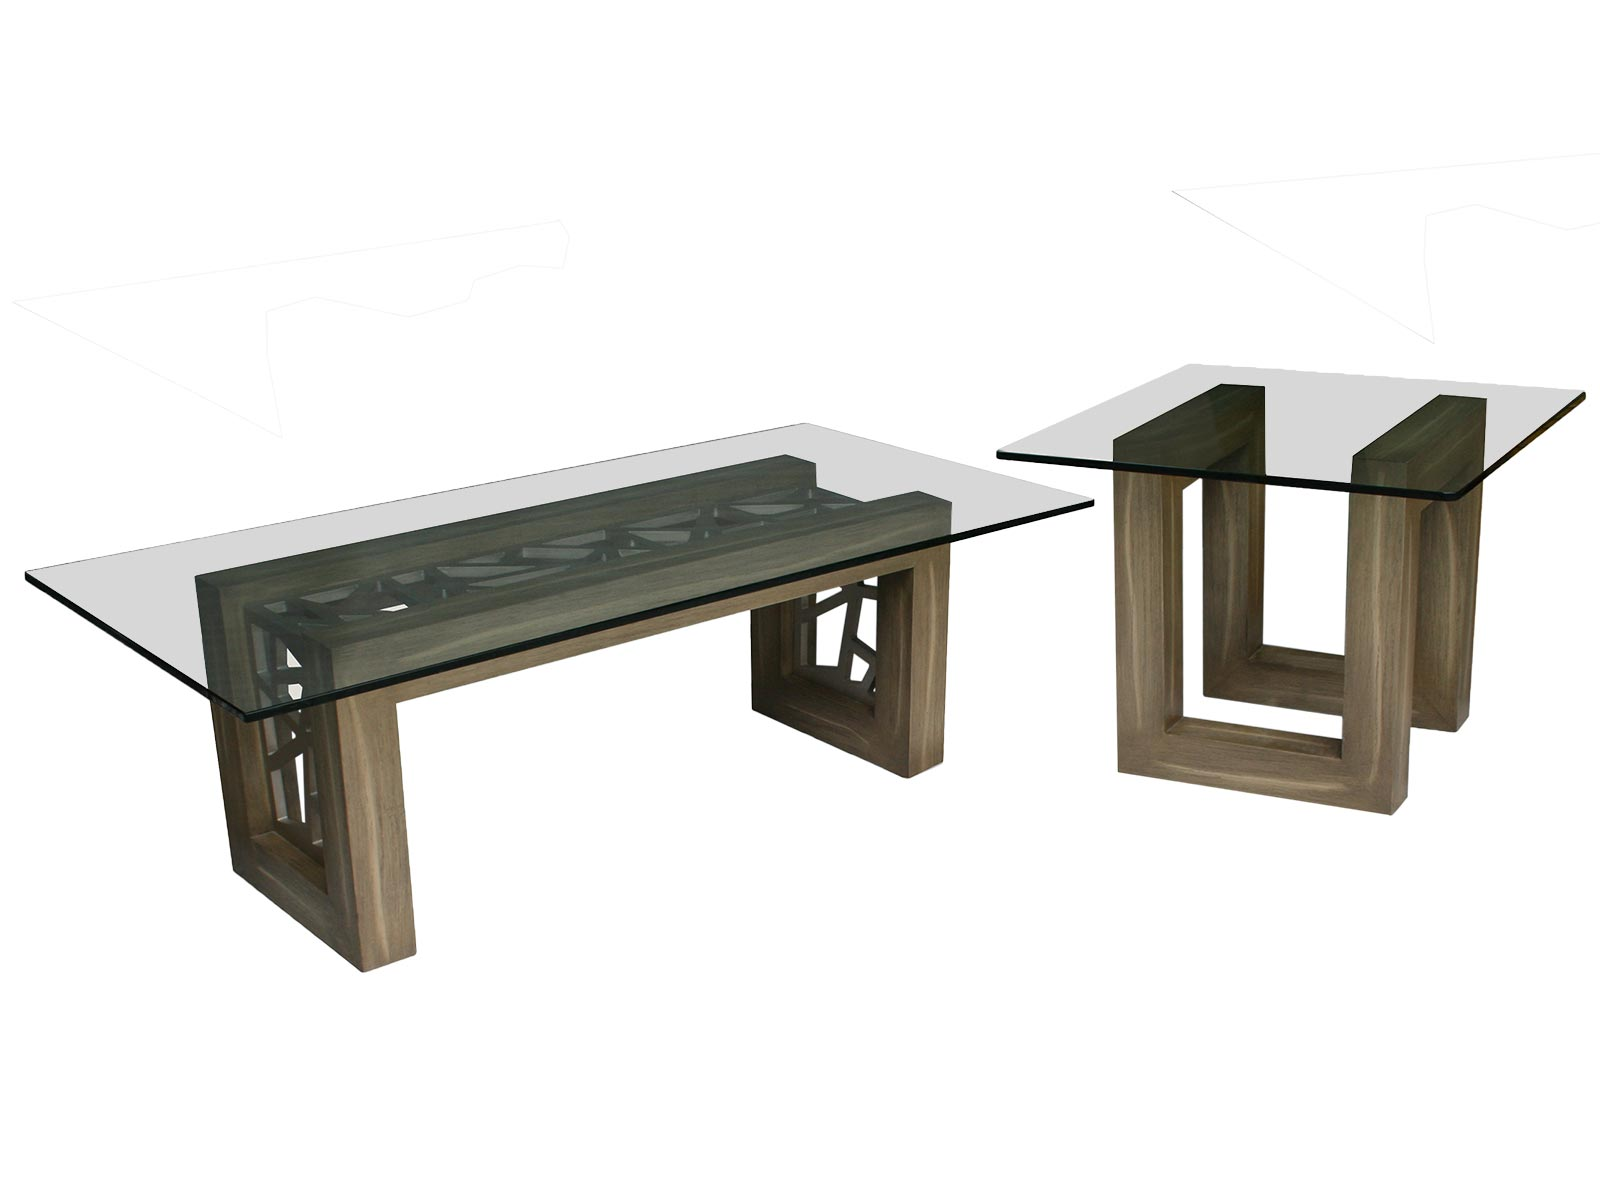 Precio de cristal para mesa cool mesas de comedor precio - Cristales para mesas precios ...